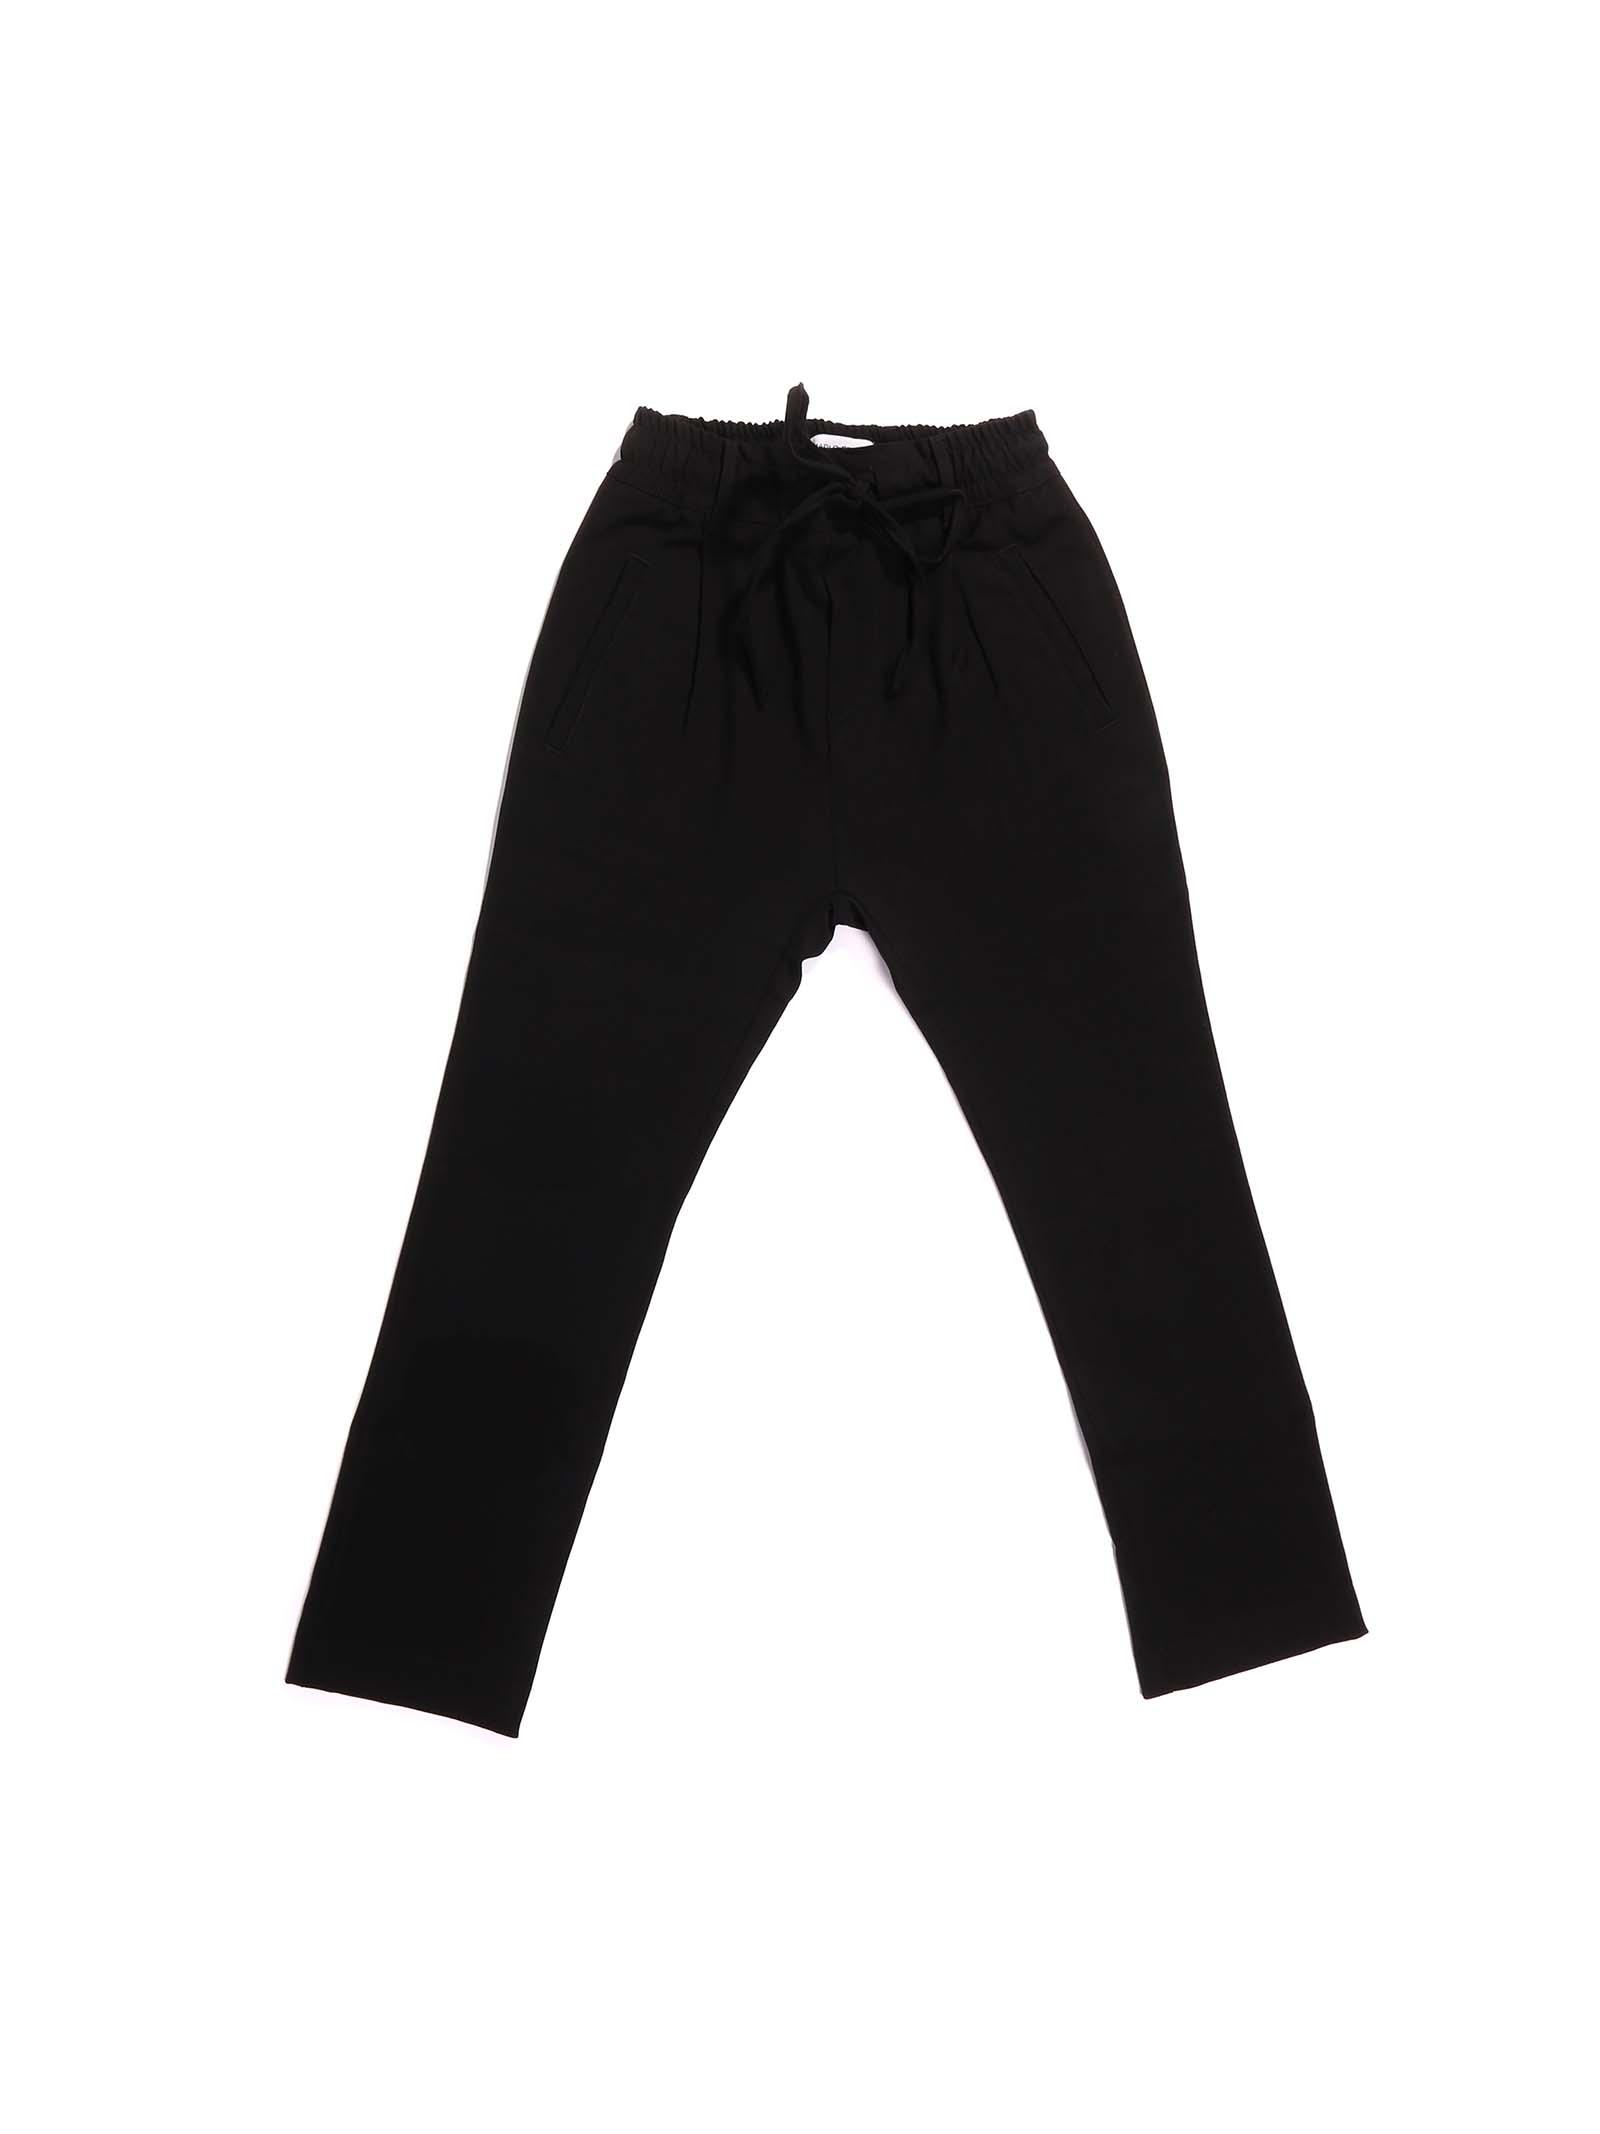 pantalone nero Paolo Pecora | Pantalone | P2500NERO